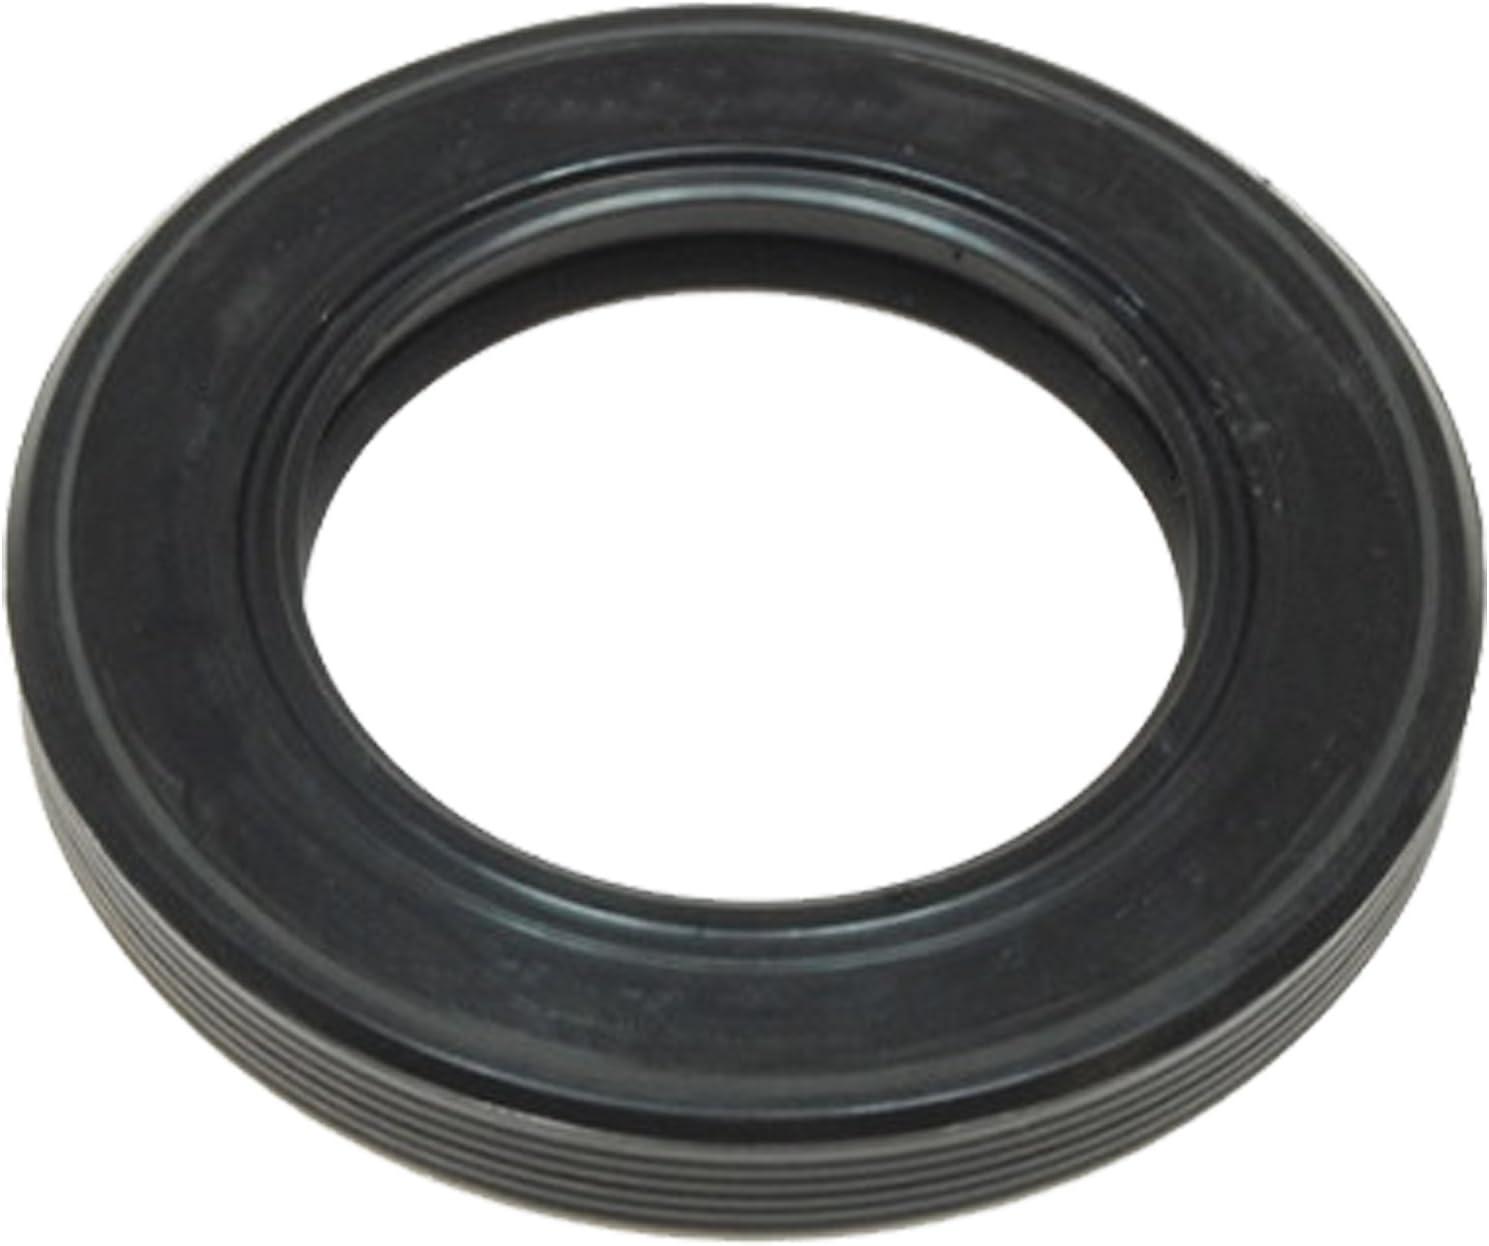 Spares2go tambor aceite Rodamientos sello para Blomberg Lavadora (45x 72x 10)